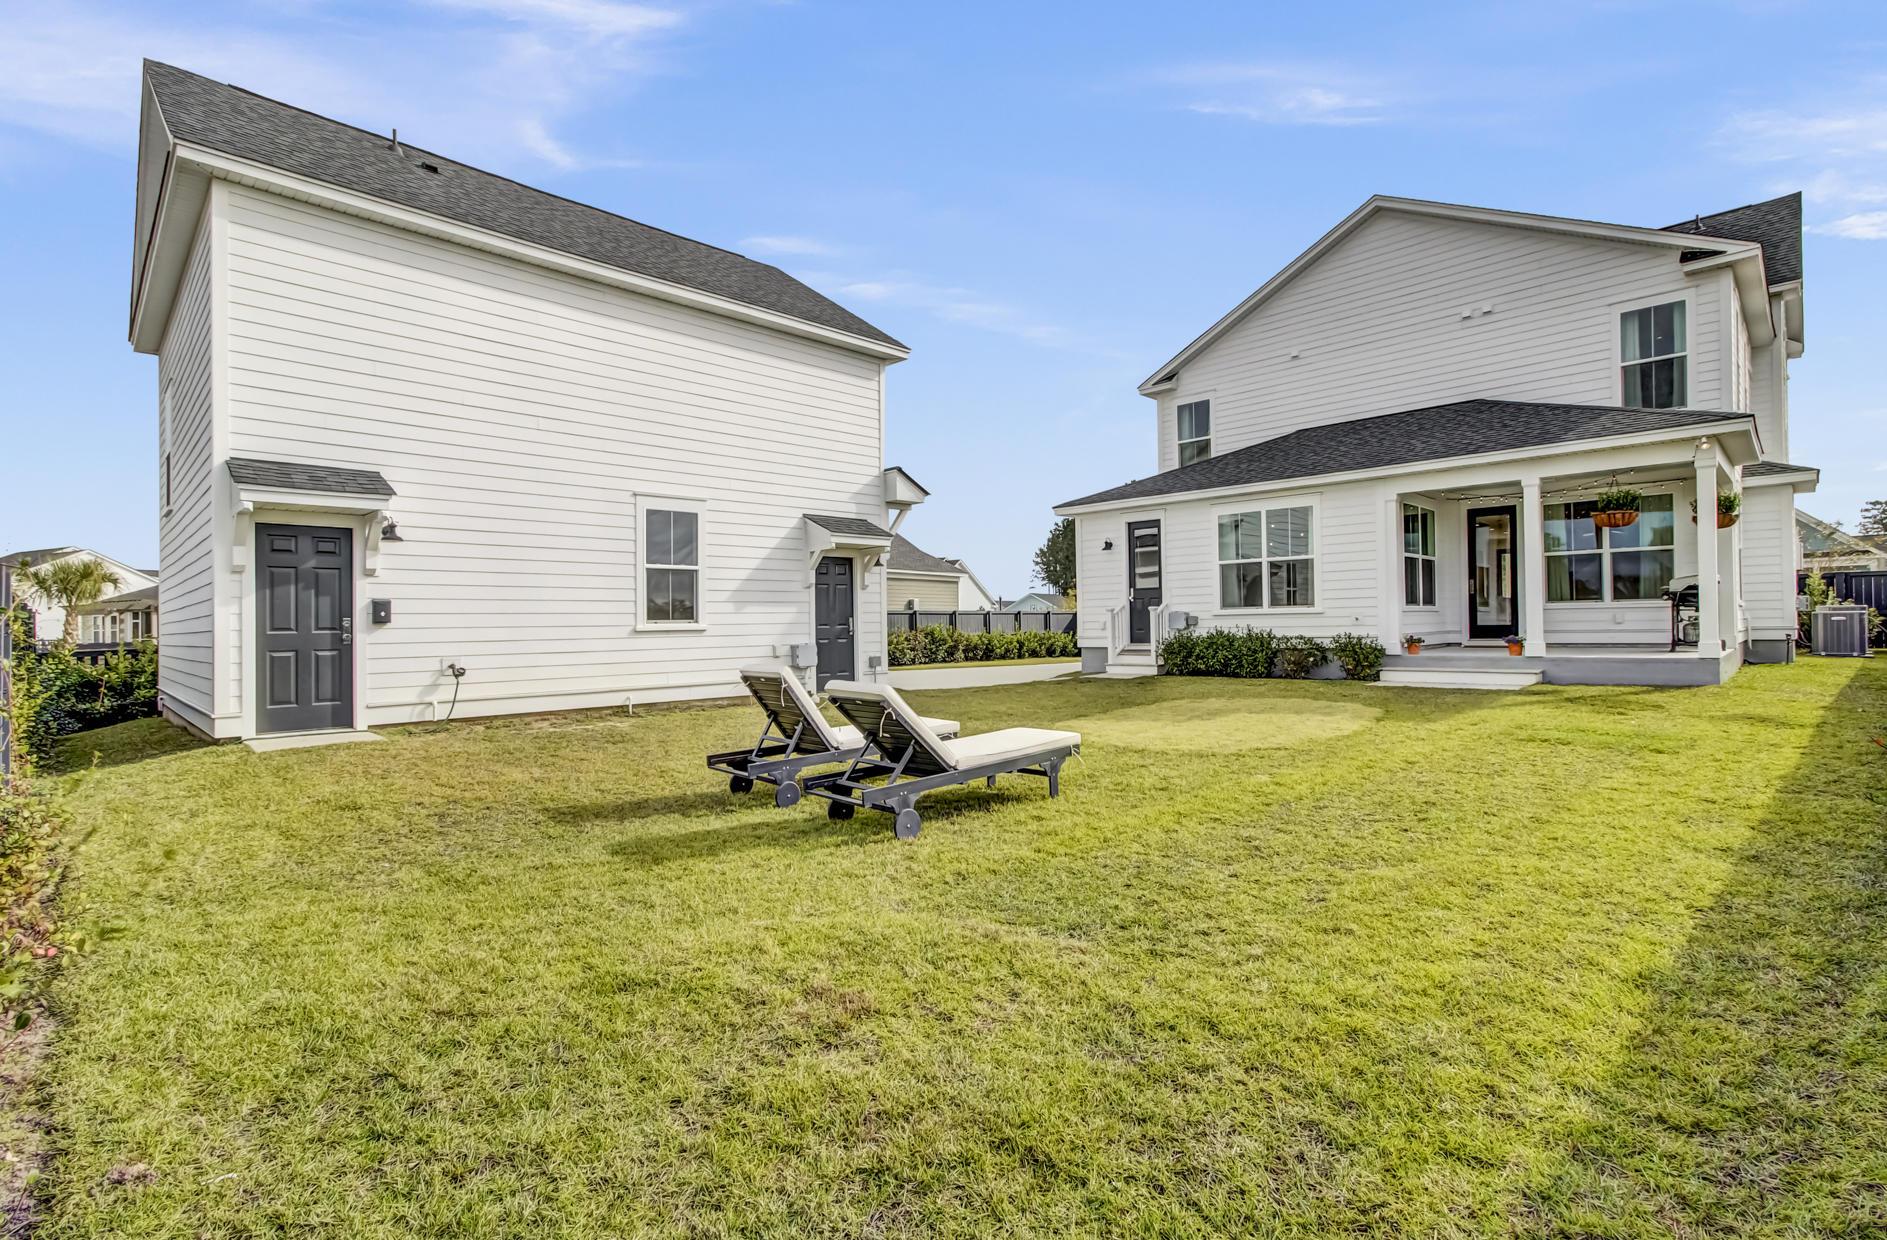 Carnes Crossroads Homes For Sale - 185 Callibluff, Summerville, SC - 5